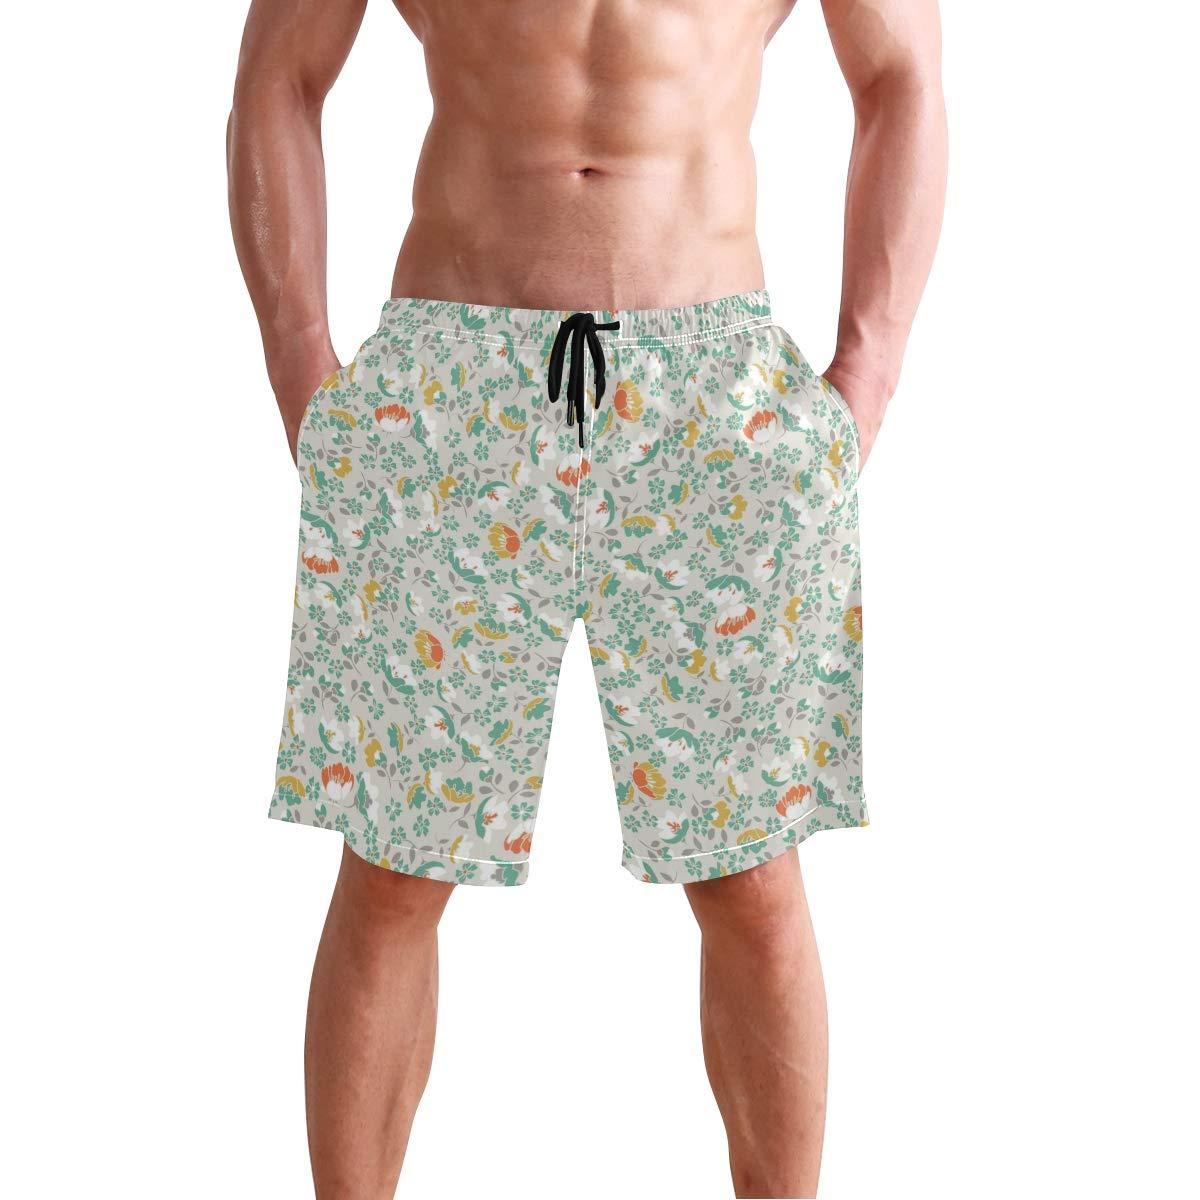 WIHVE Mens Beach Swim Trunks Flower Floral Cloth Pattern Boxer Swimsuit Underwear Board Shorts with Pocket